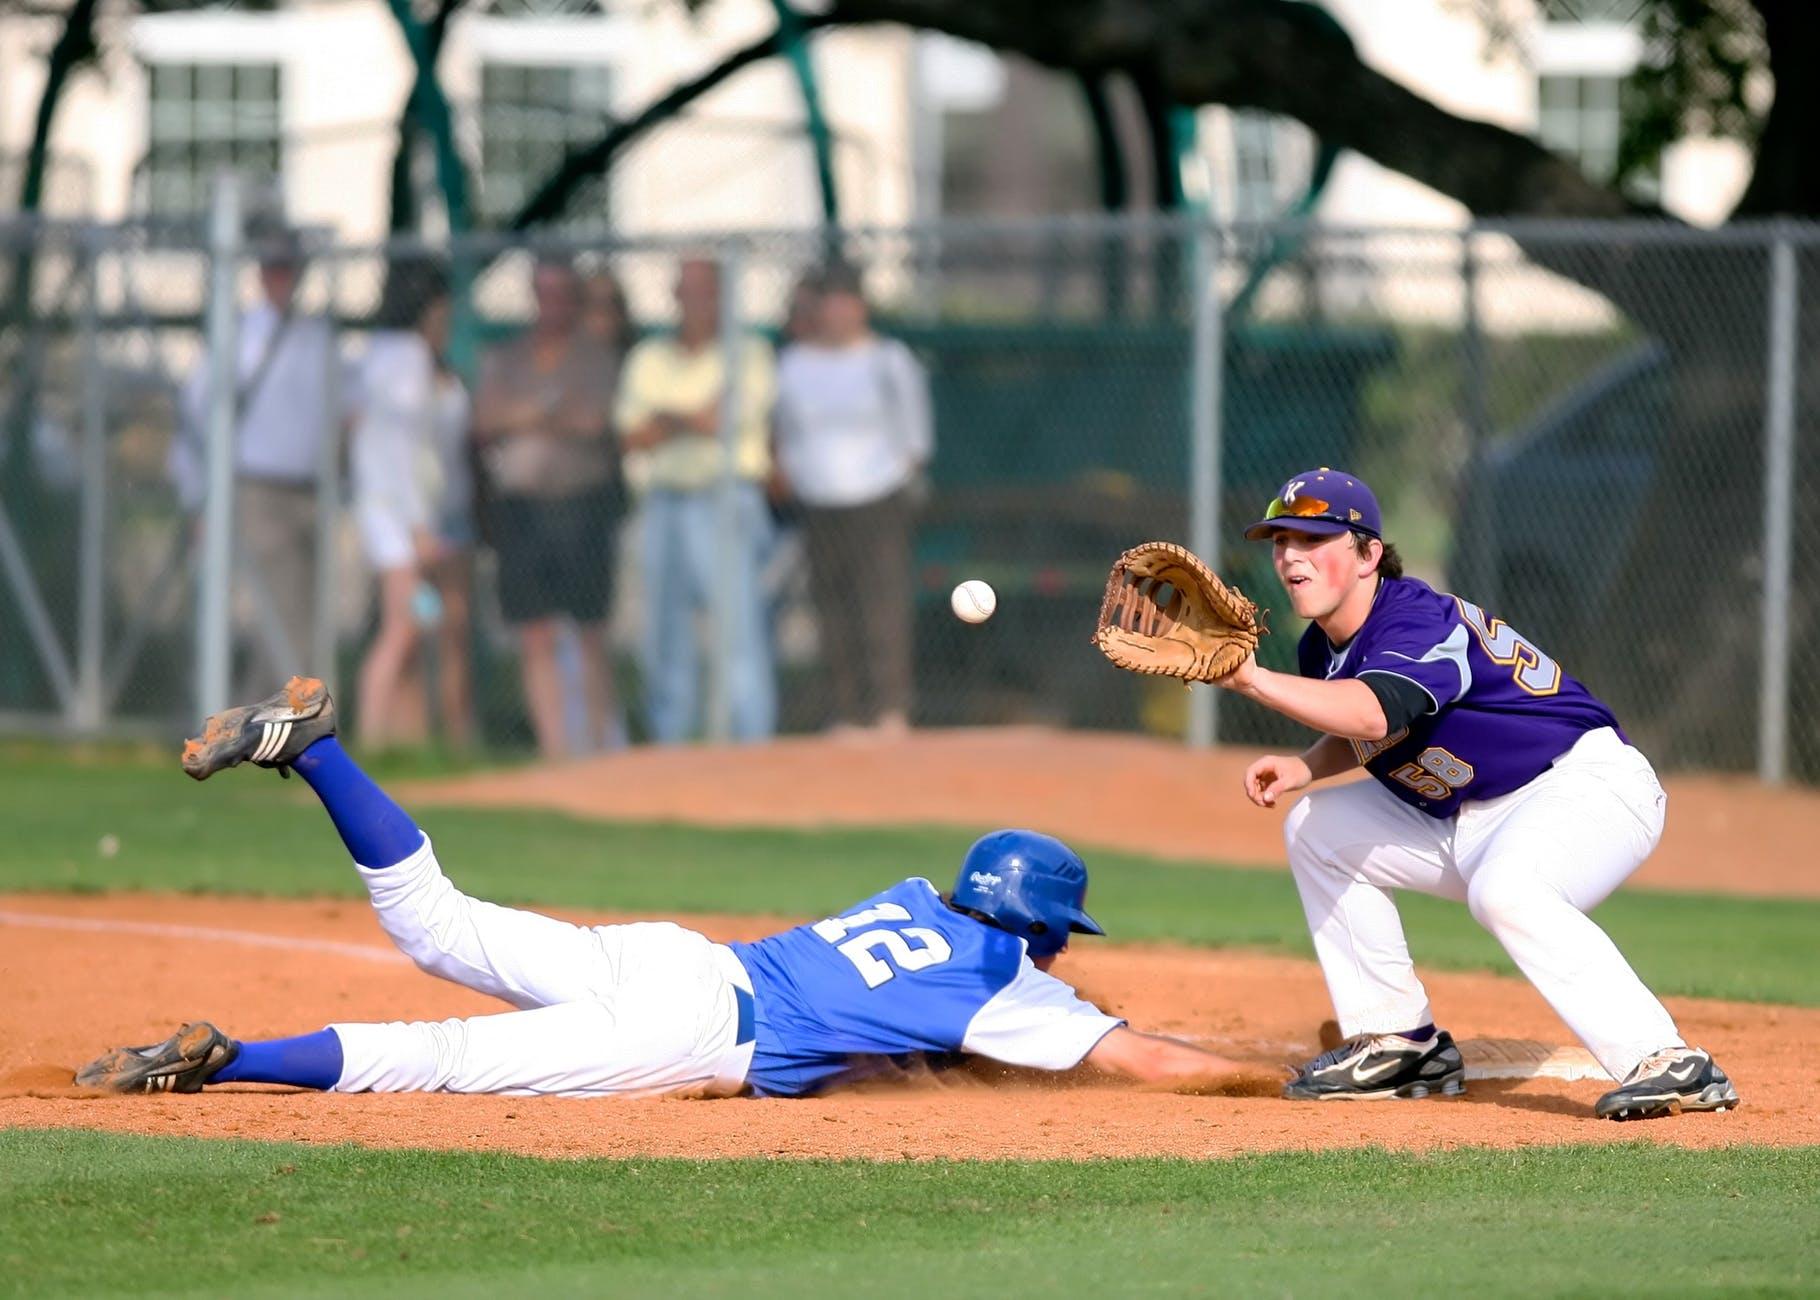 Baseball player using mental skills while in play.